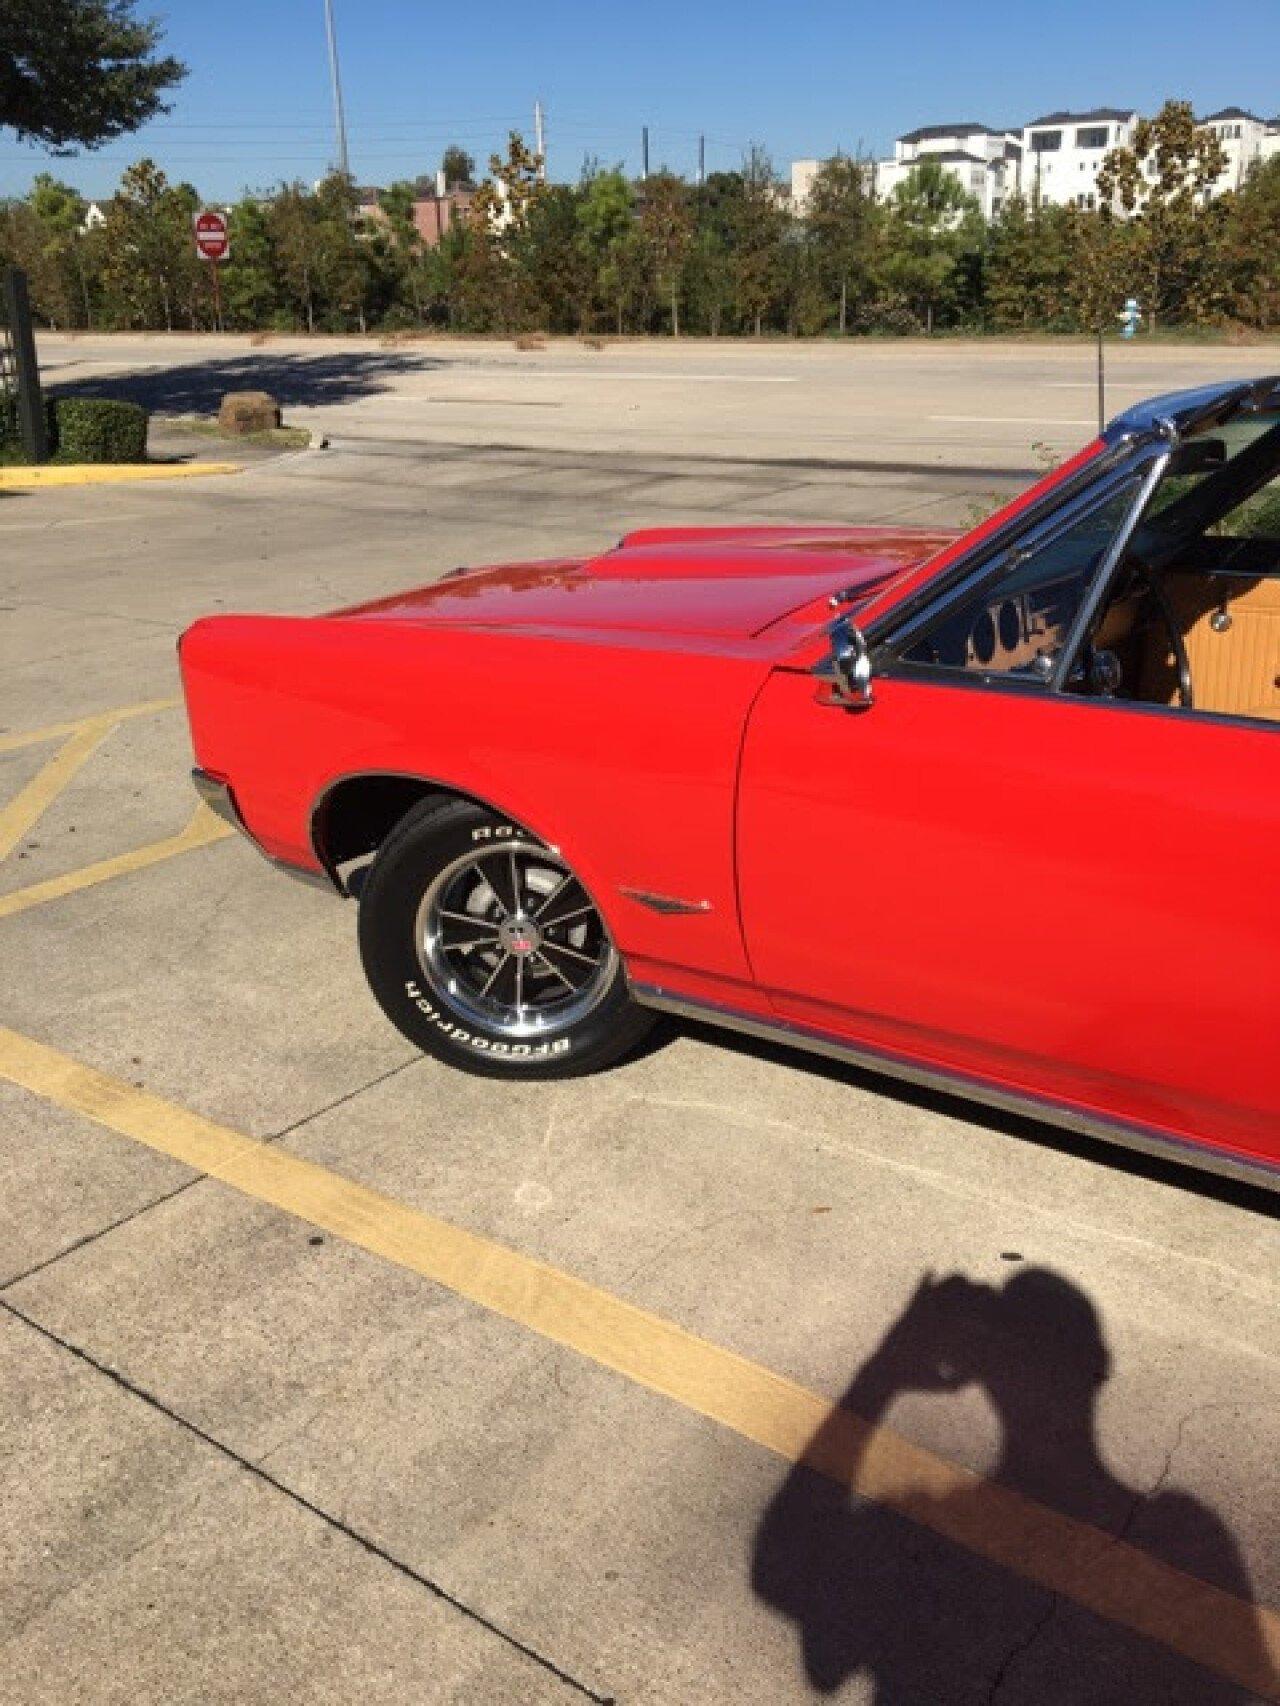 Private Car Sale In Houston Tx: 1966 Pontiac GTO For Sale Near Houston, Texas 77046